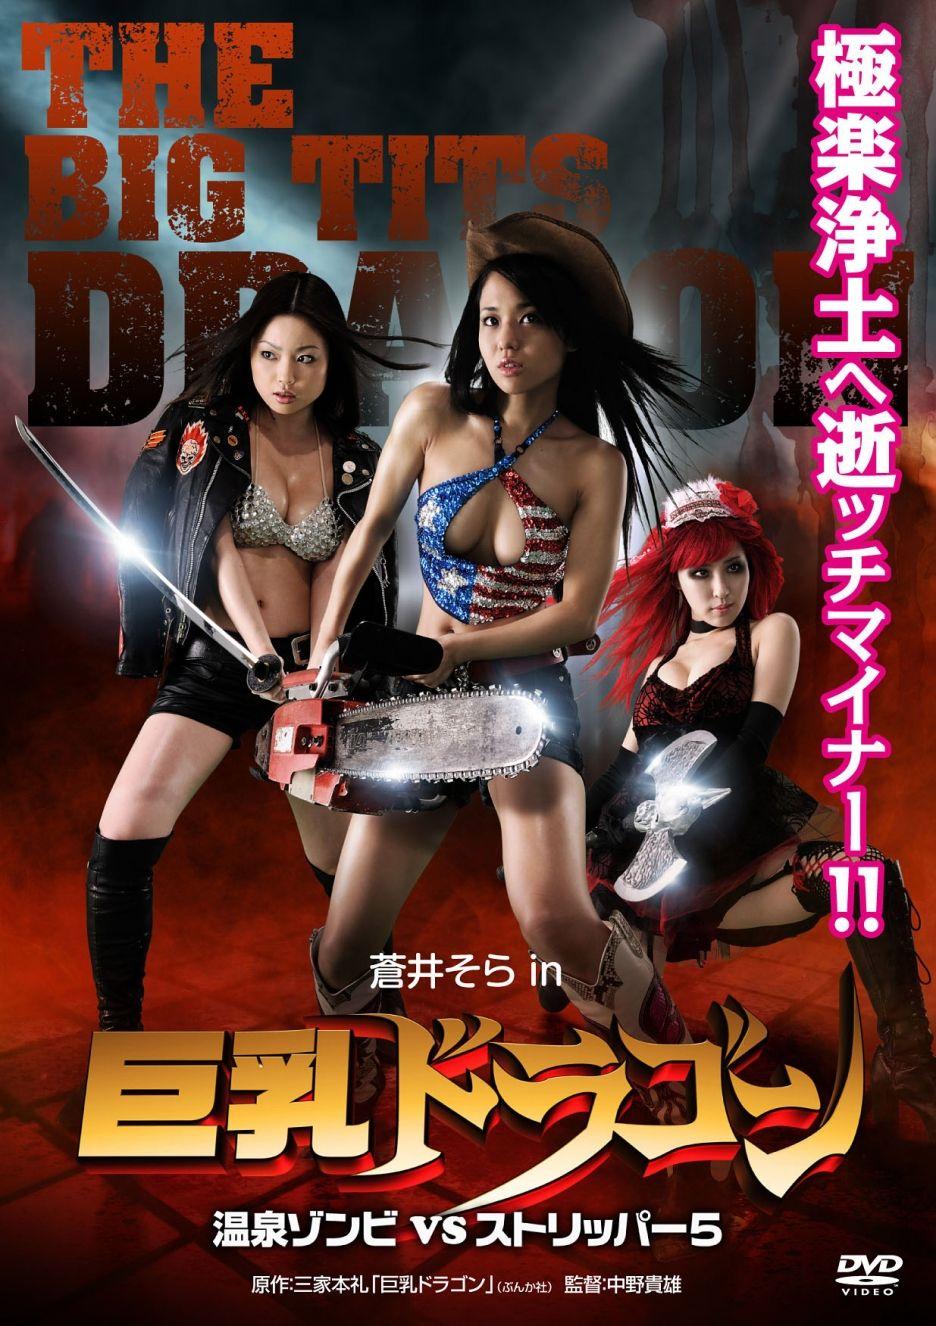 big tits zombies | wild asian movies | pinterest | movie